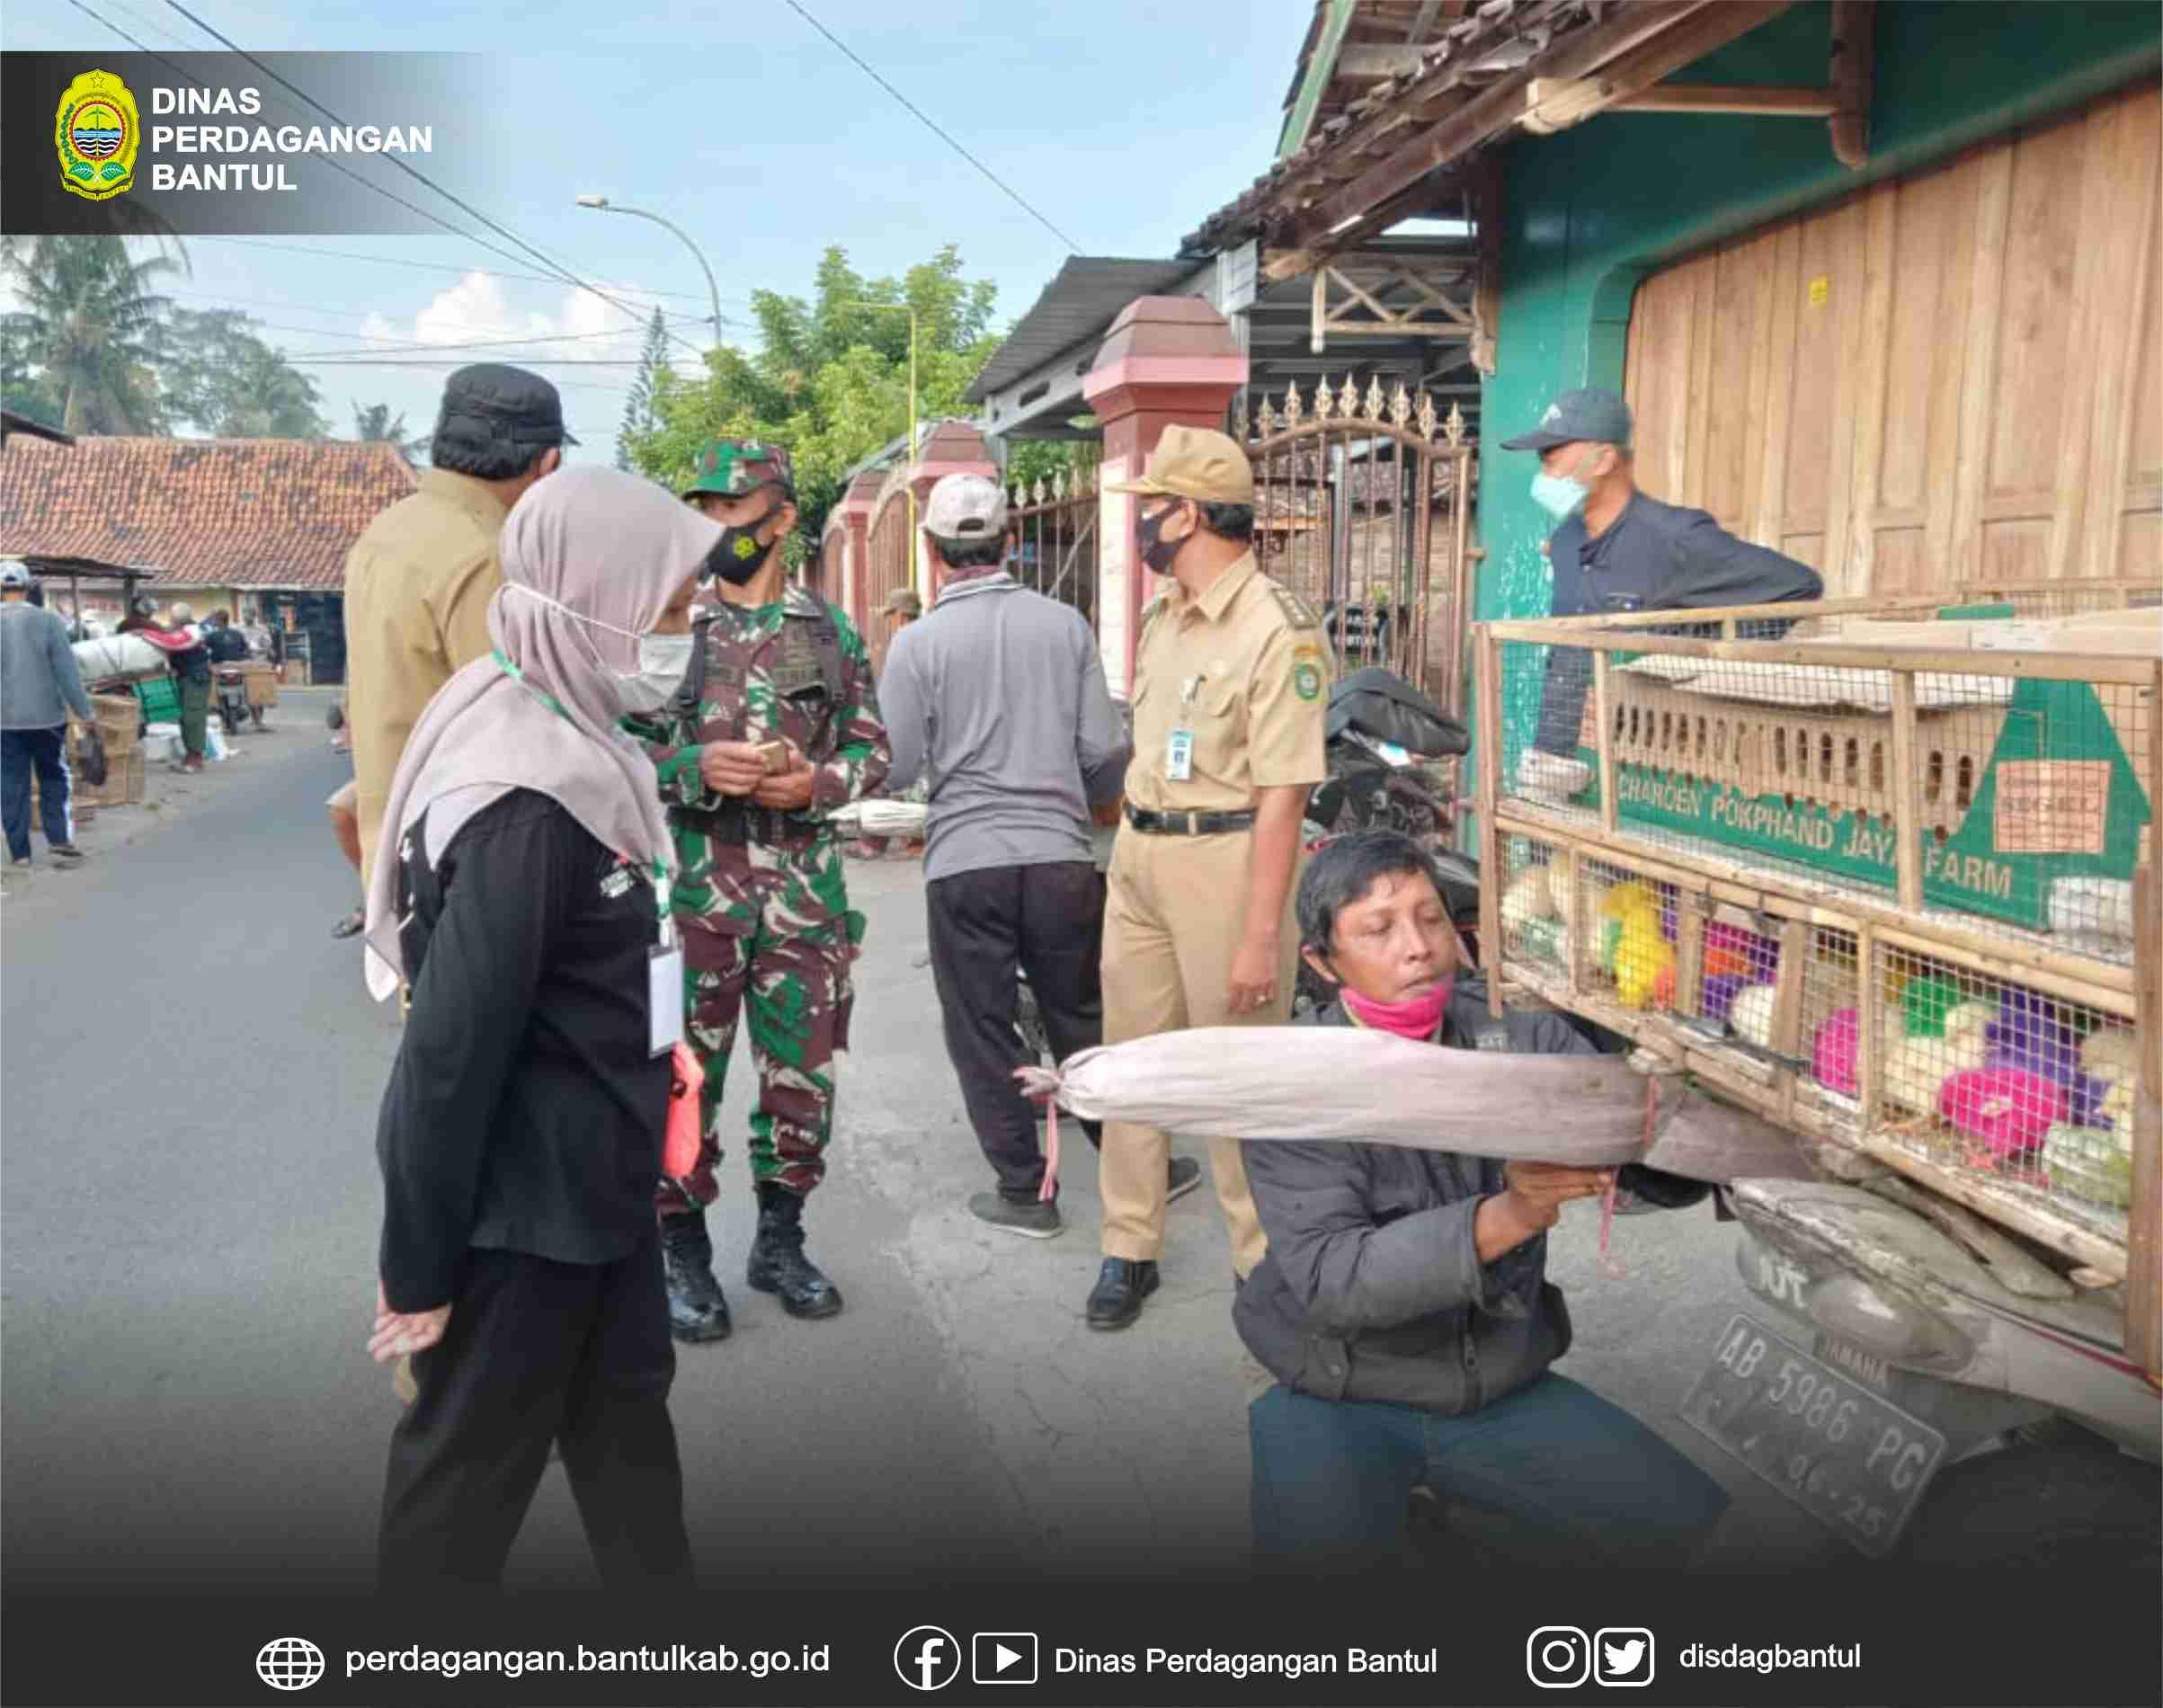 Pemindahan Dan Penataan Pedagang  Unggas Dan Burung di Pasar Turi